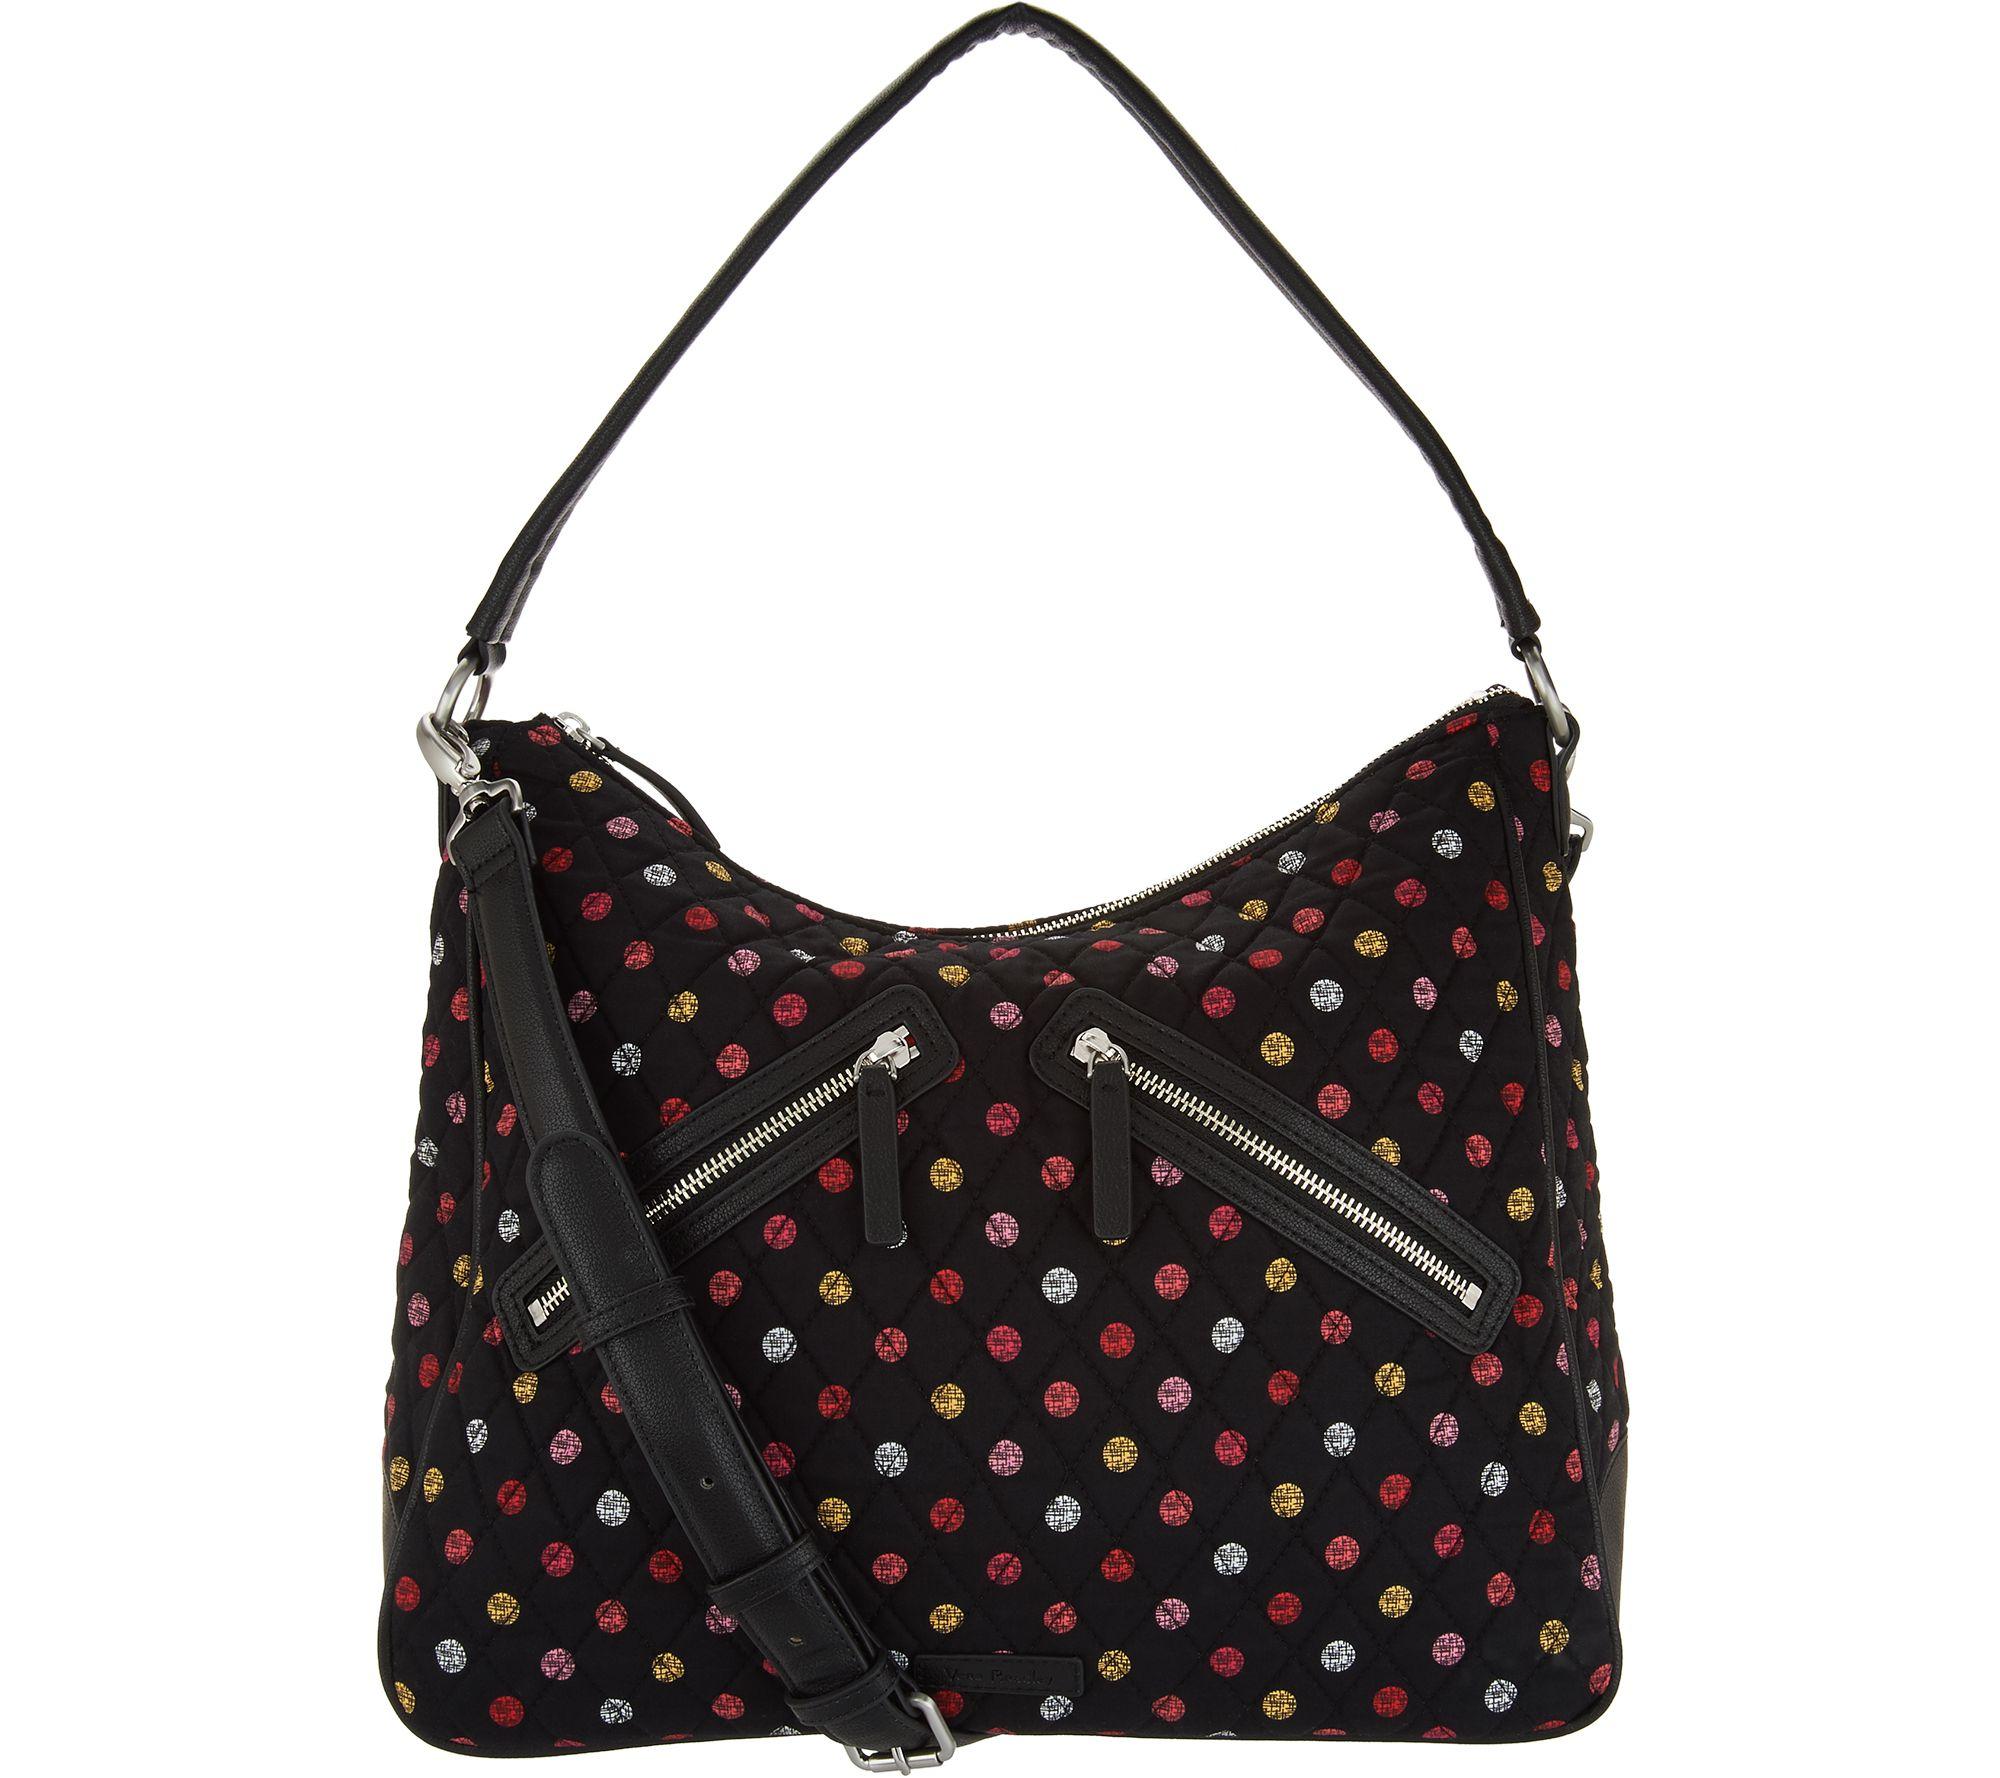 4f83c5c9e0 Vera Bradley Signature Vivian Zip Top Hobo Handbag - Page 1 — QVC.com